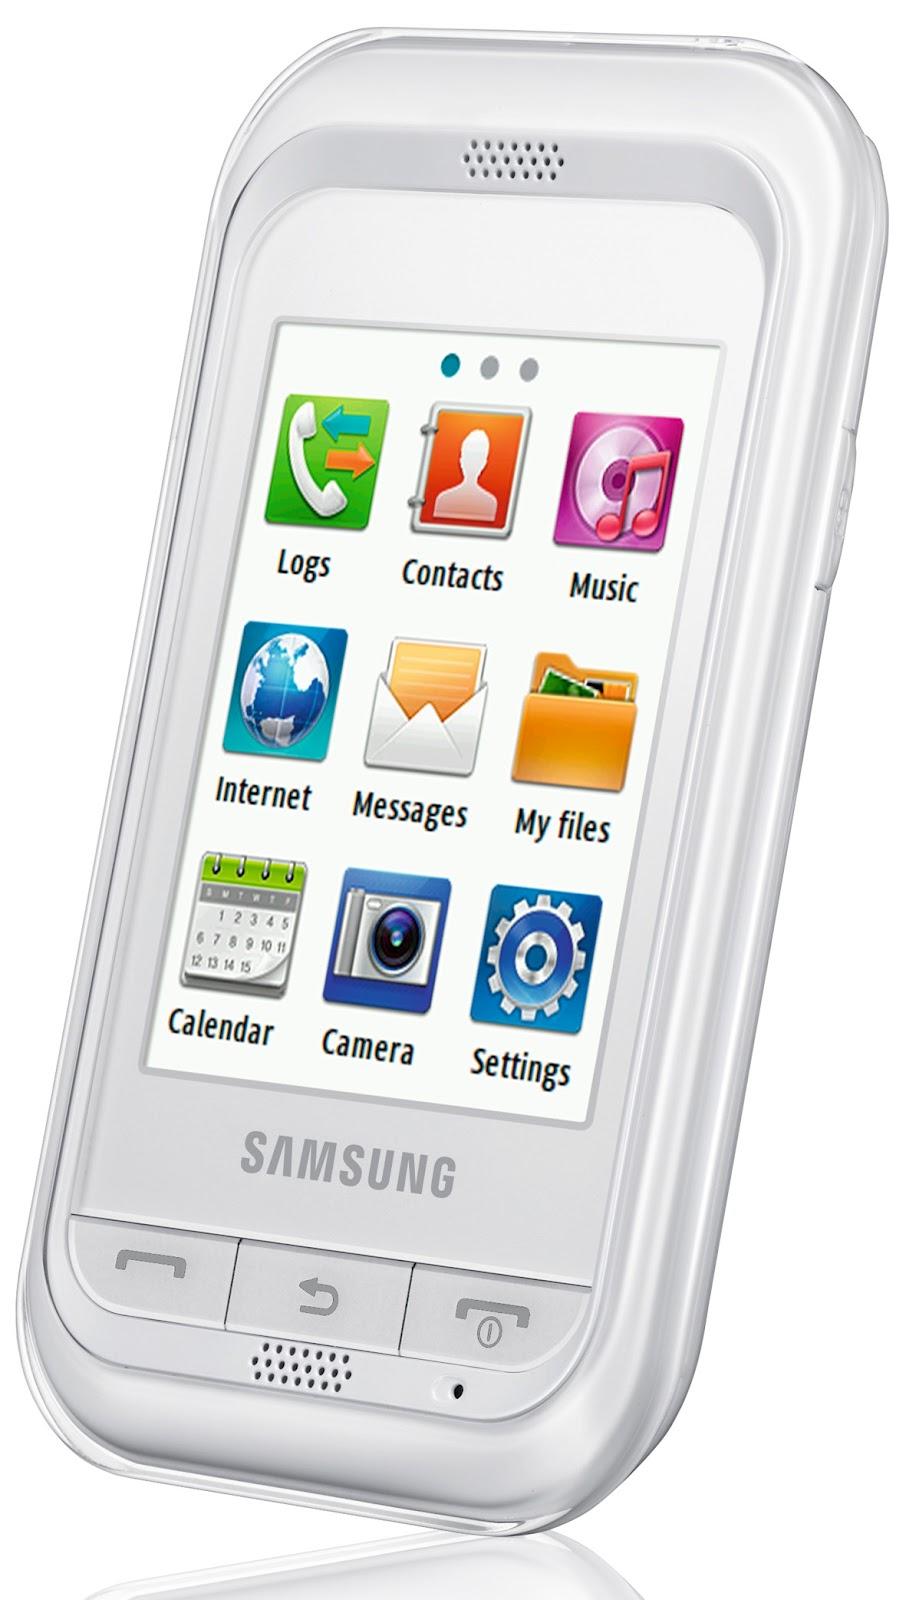 Samsung c3300i маркет - aa21